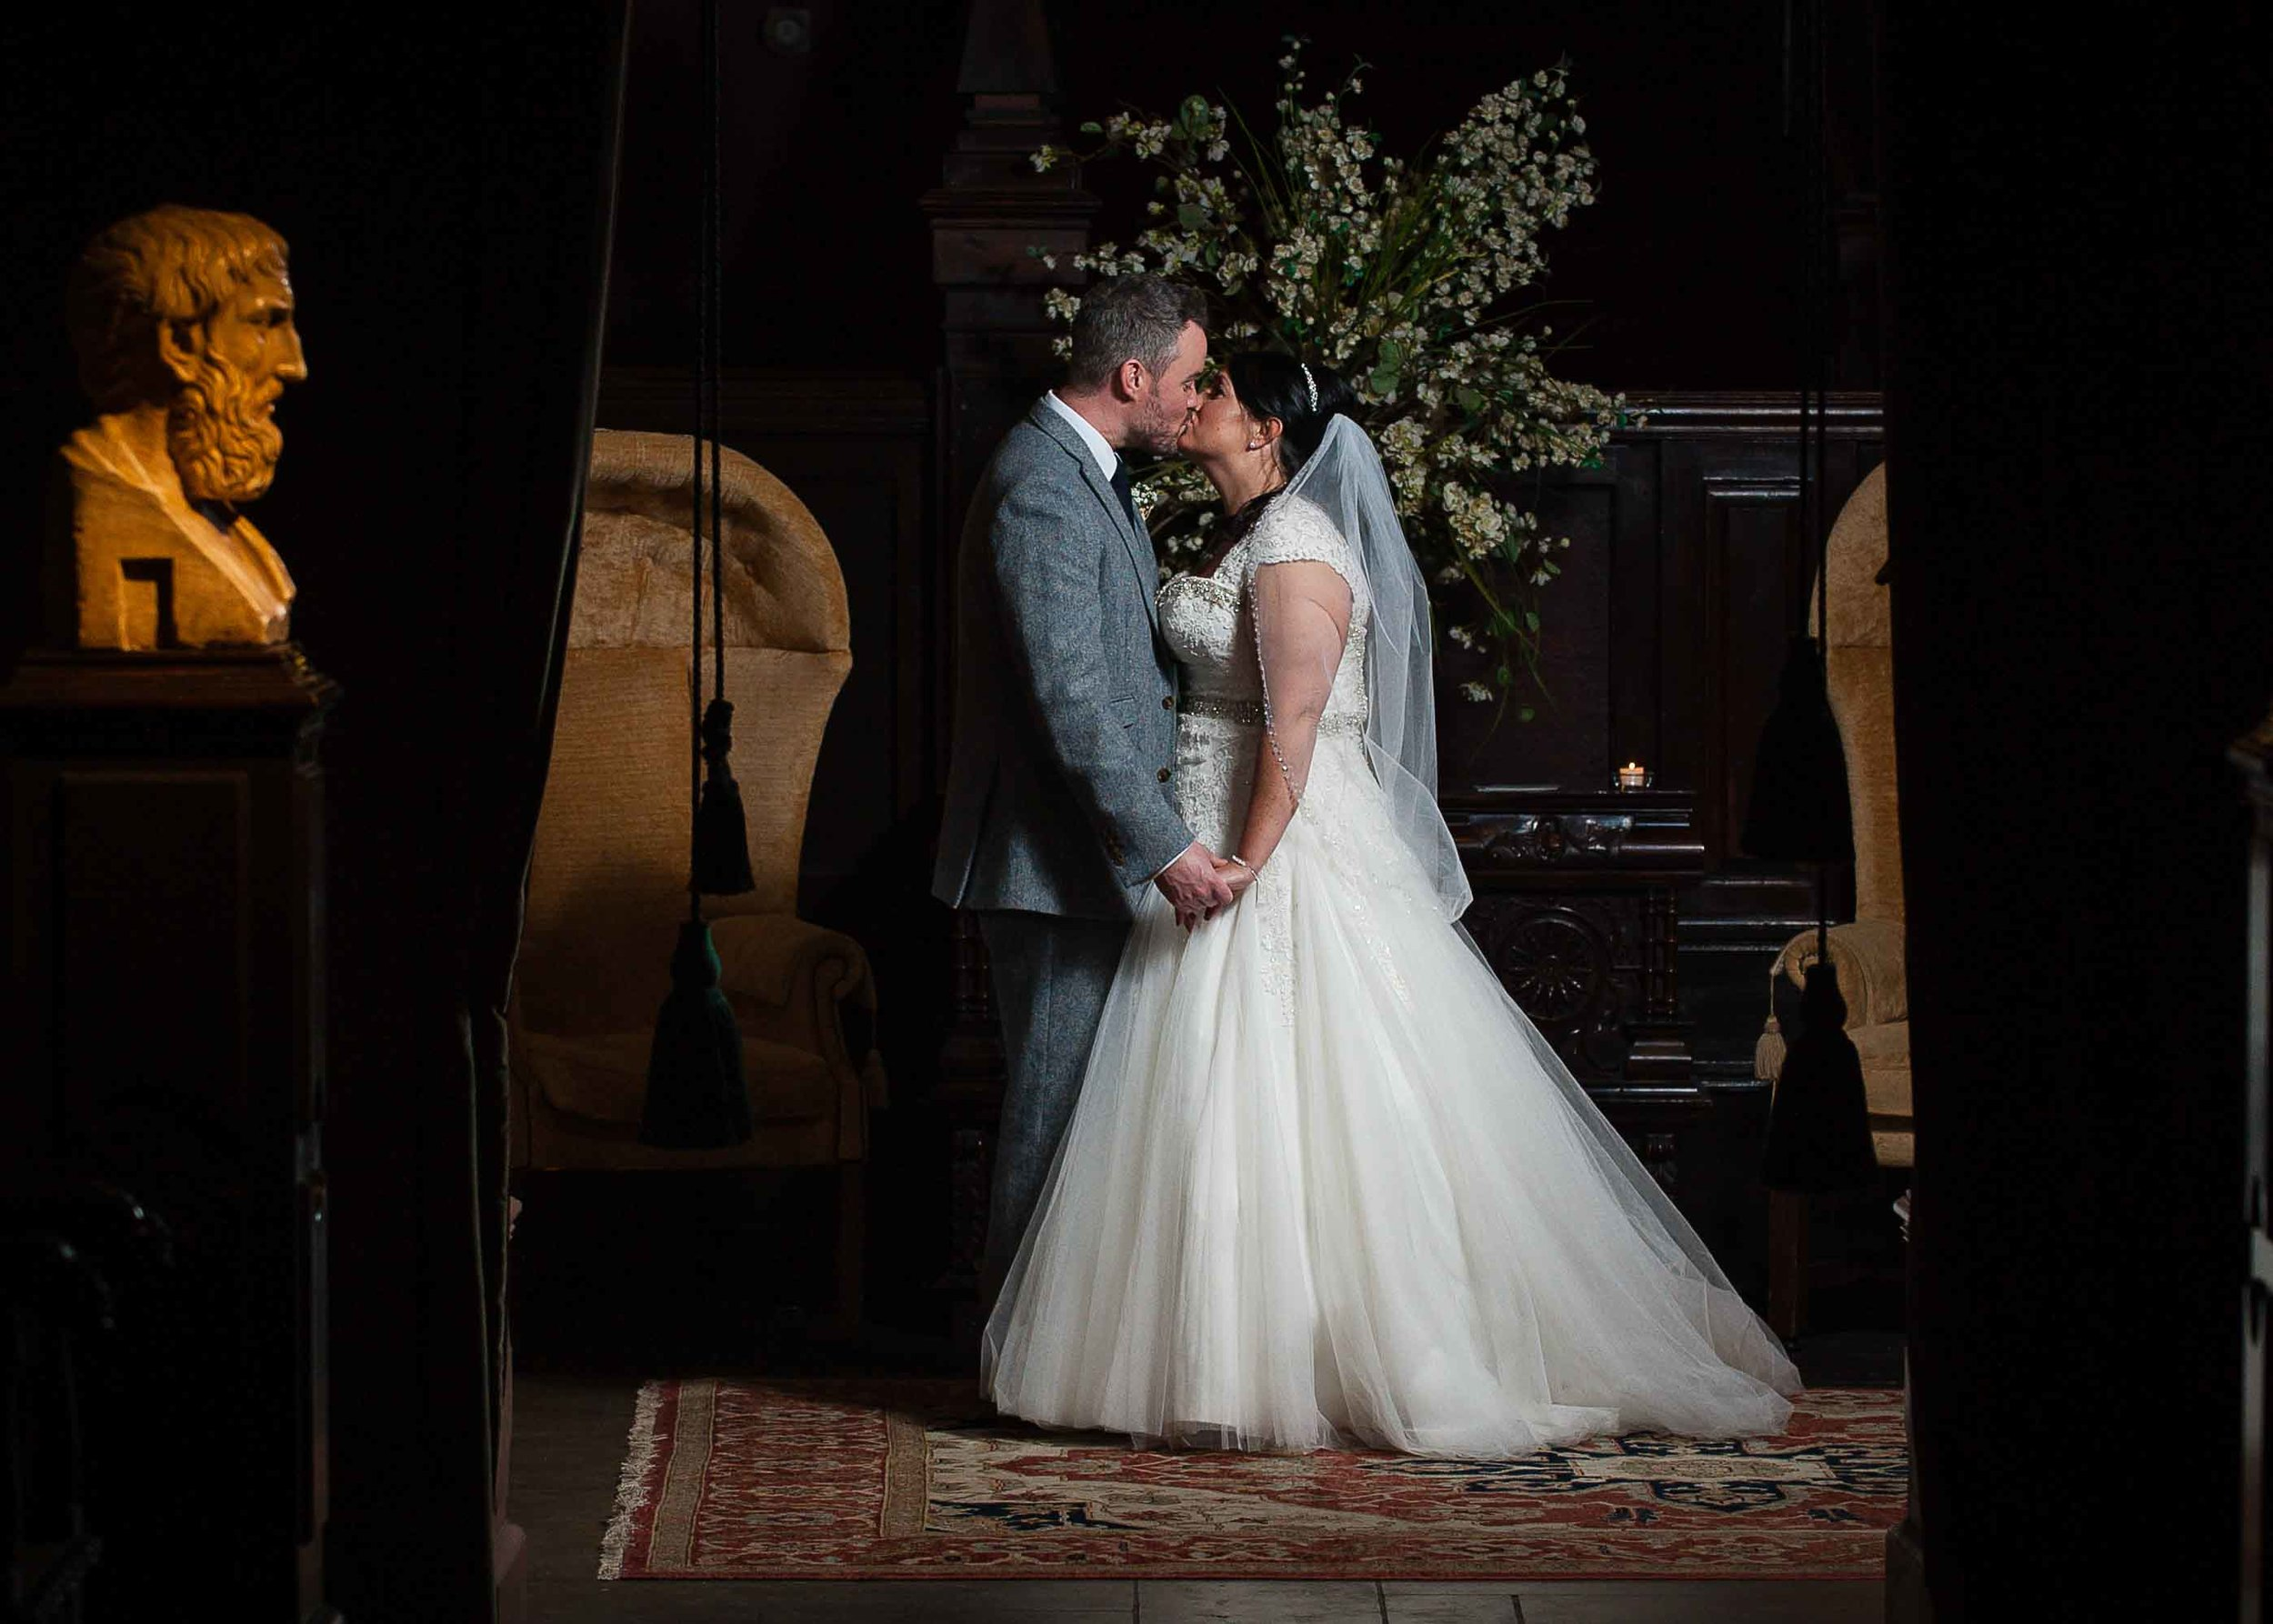 14.02.17 - Matt-Faye-Coombe-Abbey-Valentine-Wedding-Charnwood-Photography-1090.jpg